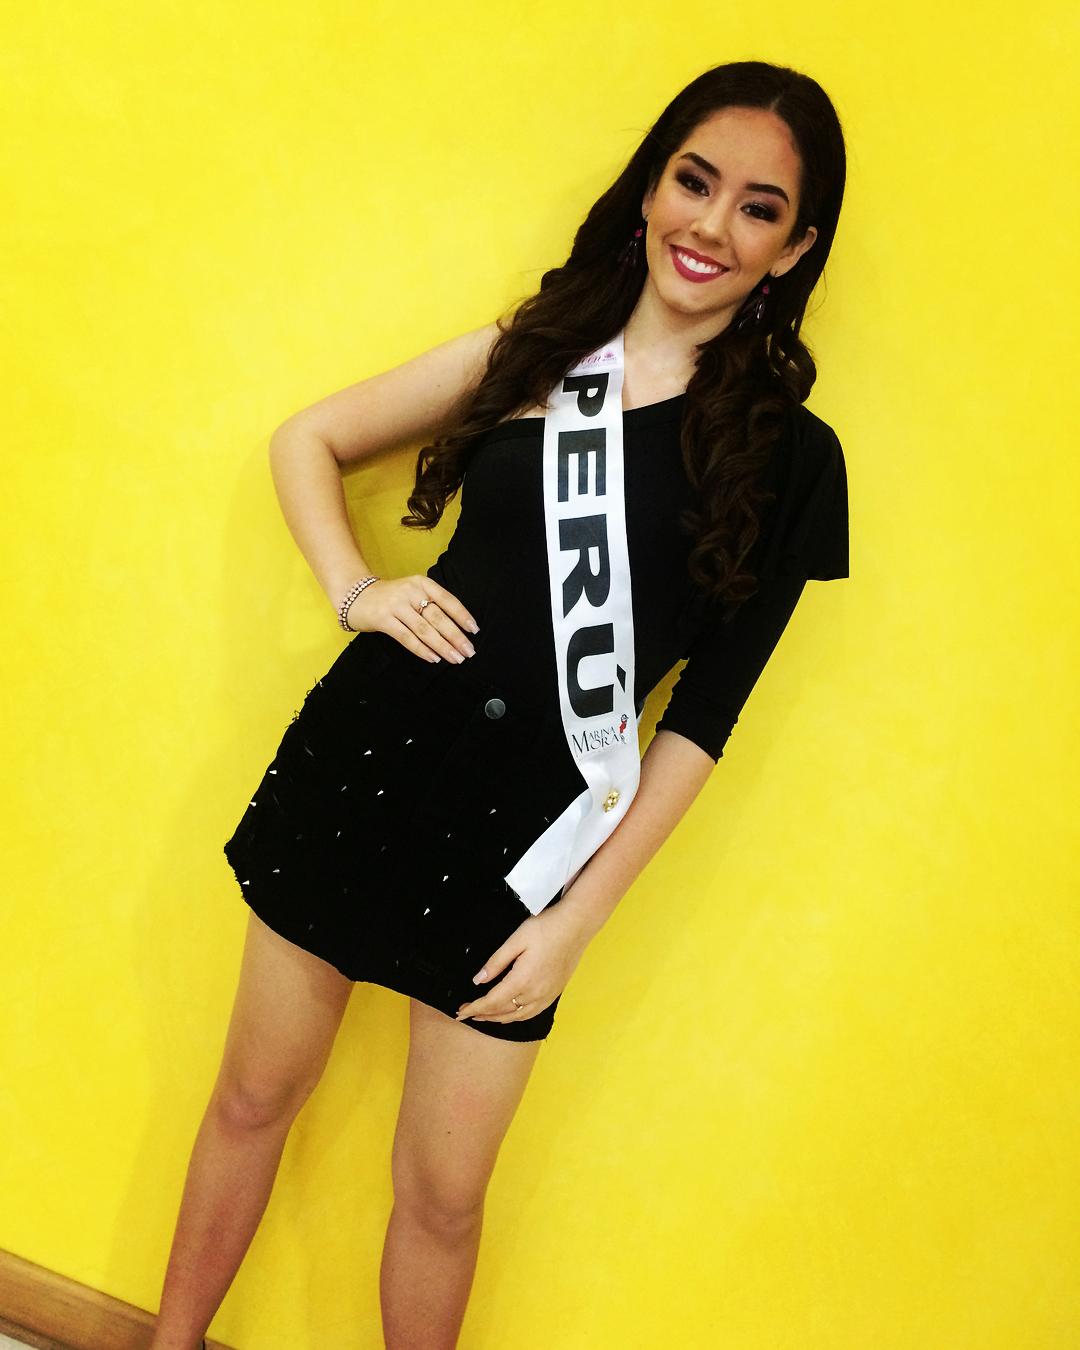 alicia montoya, miss teen model internacional 2018. 35575112